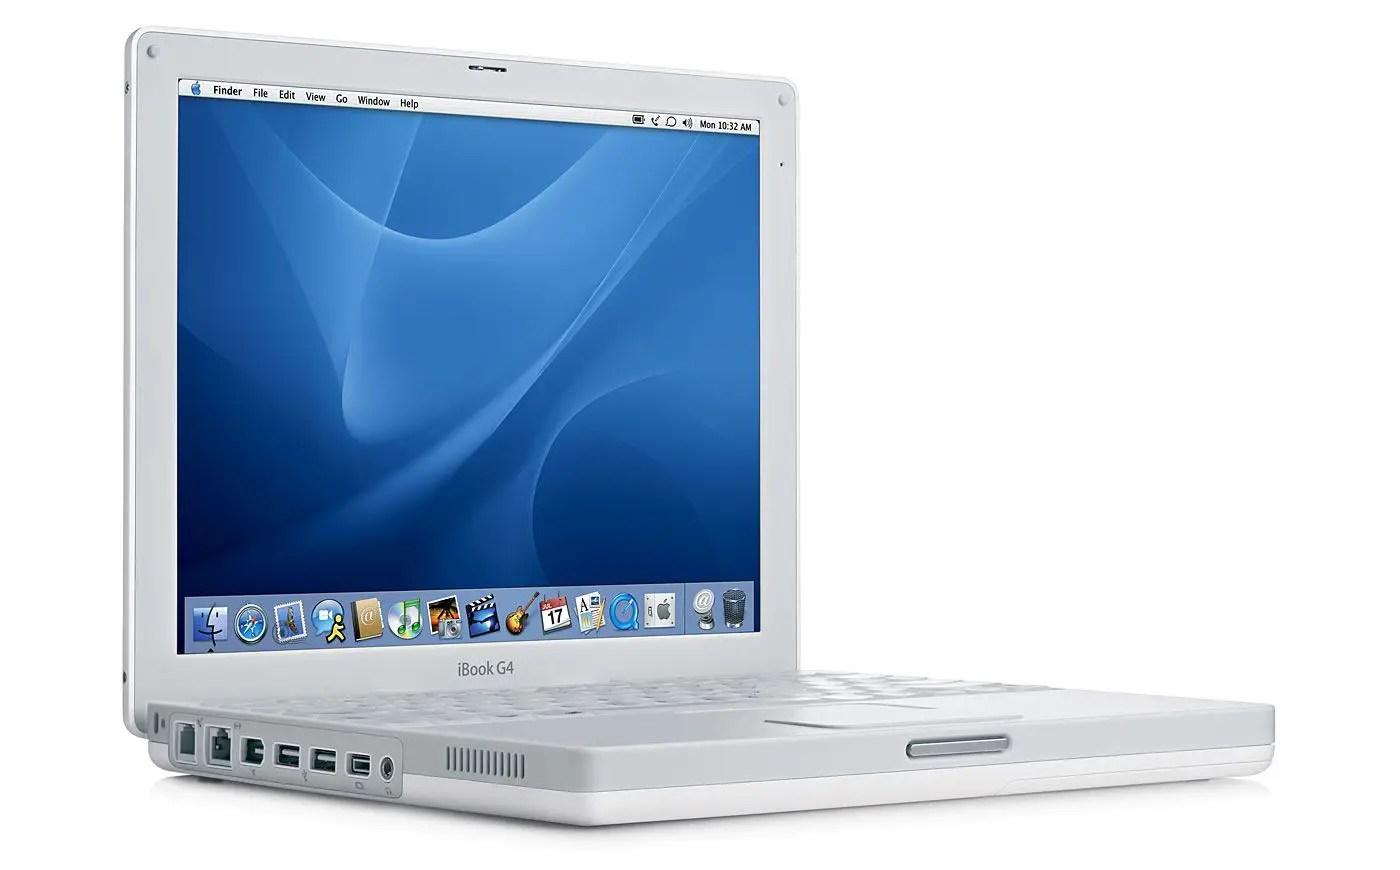 iBook G4 14.1-inch